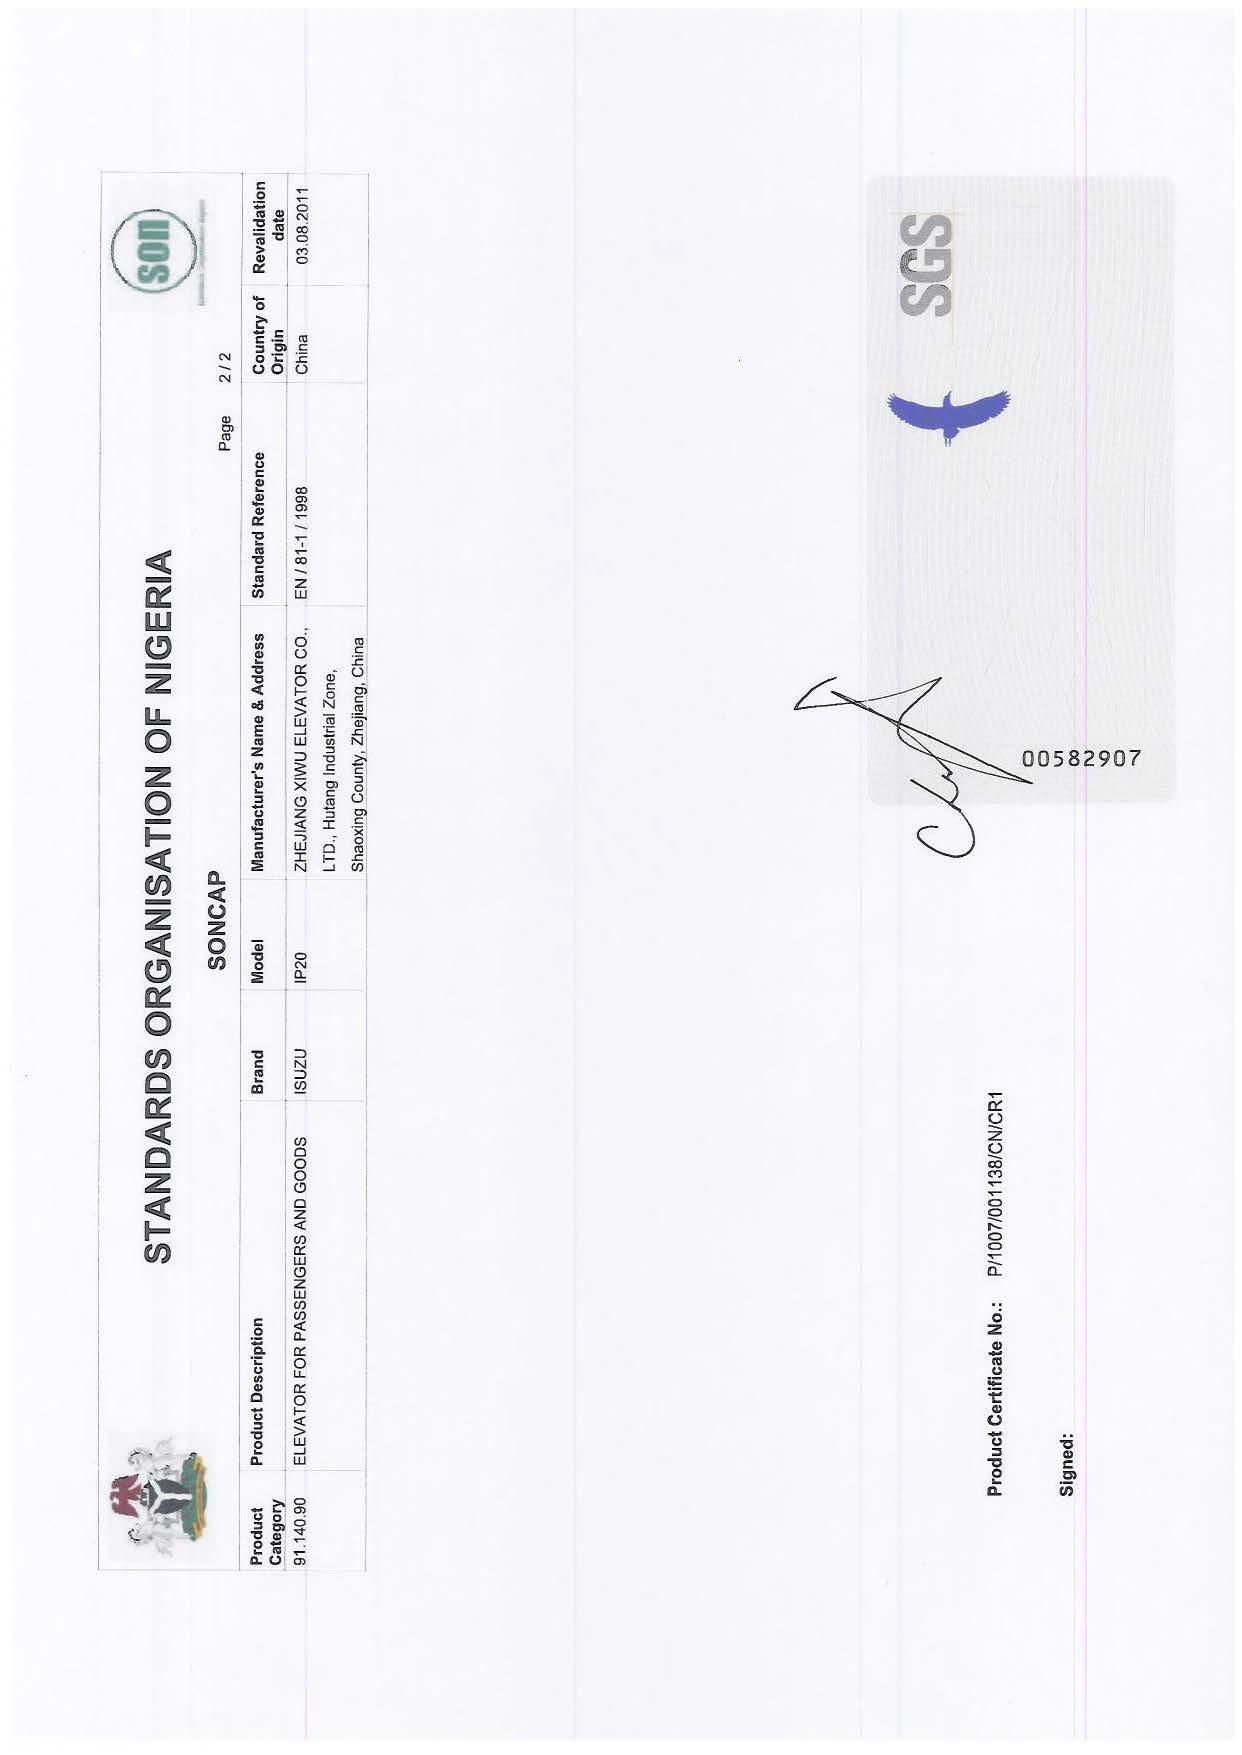 SONCAP certificate for elevator & escalator